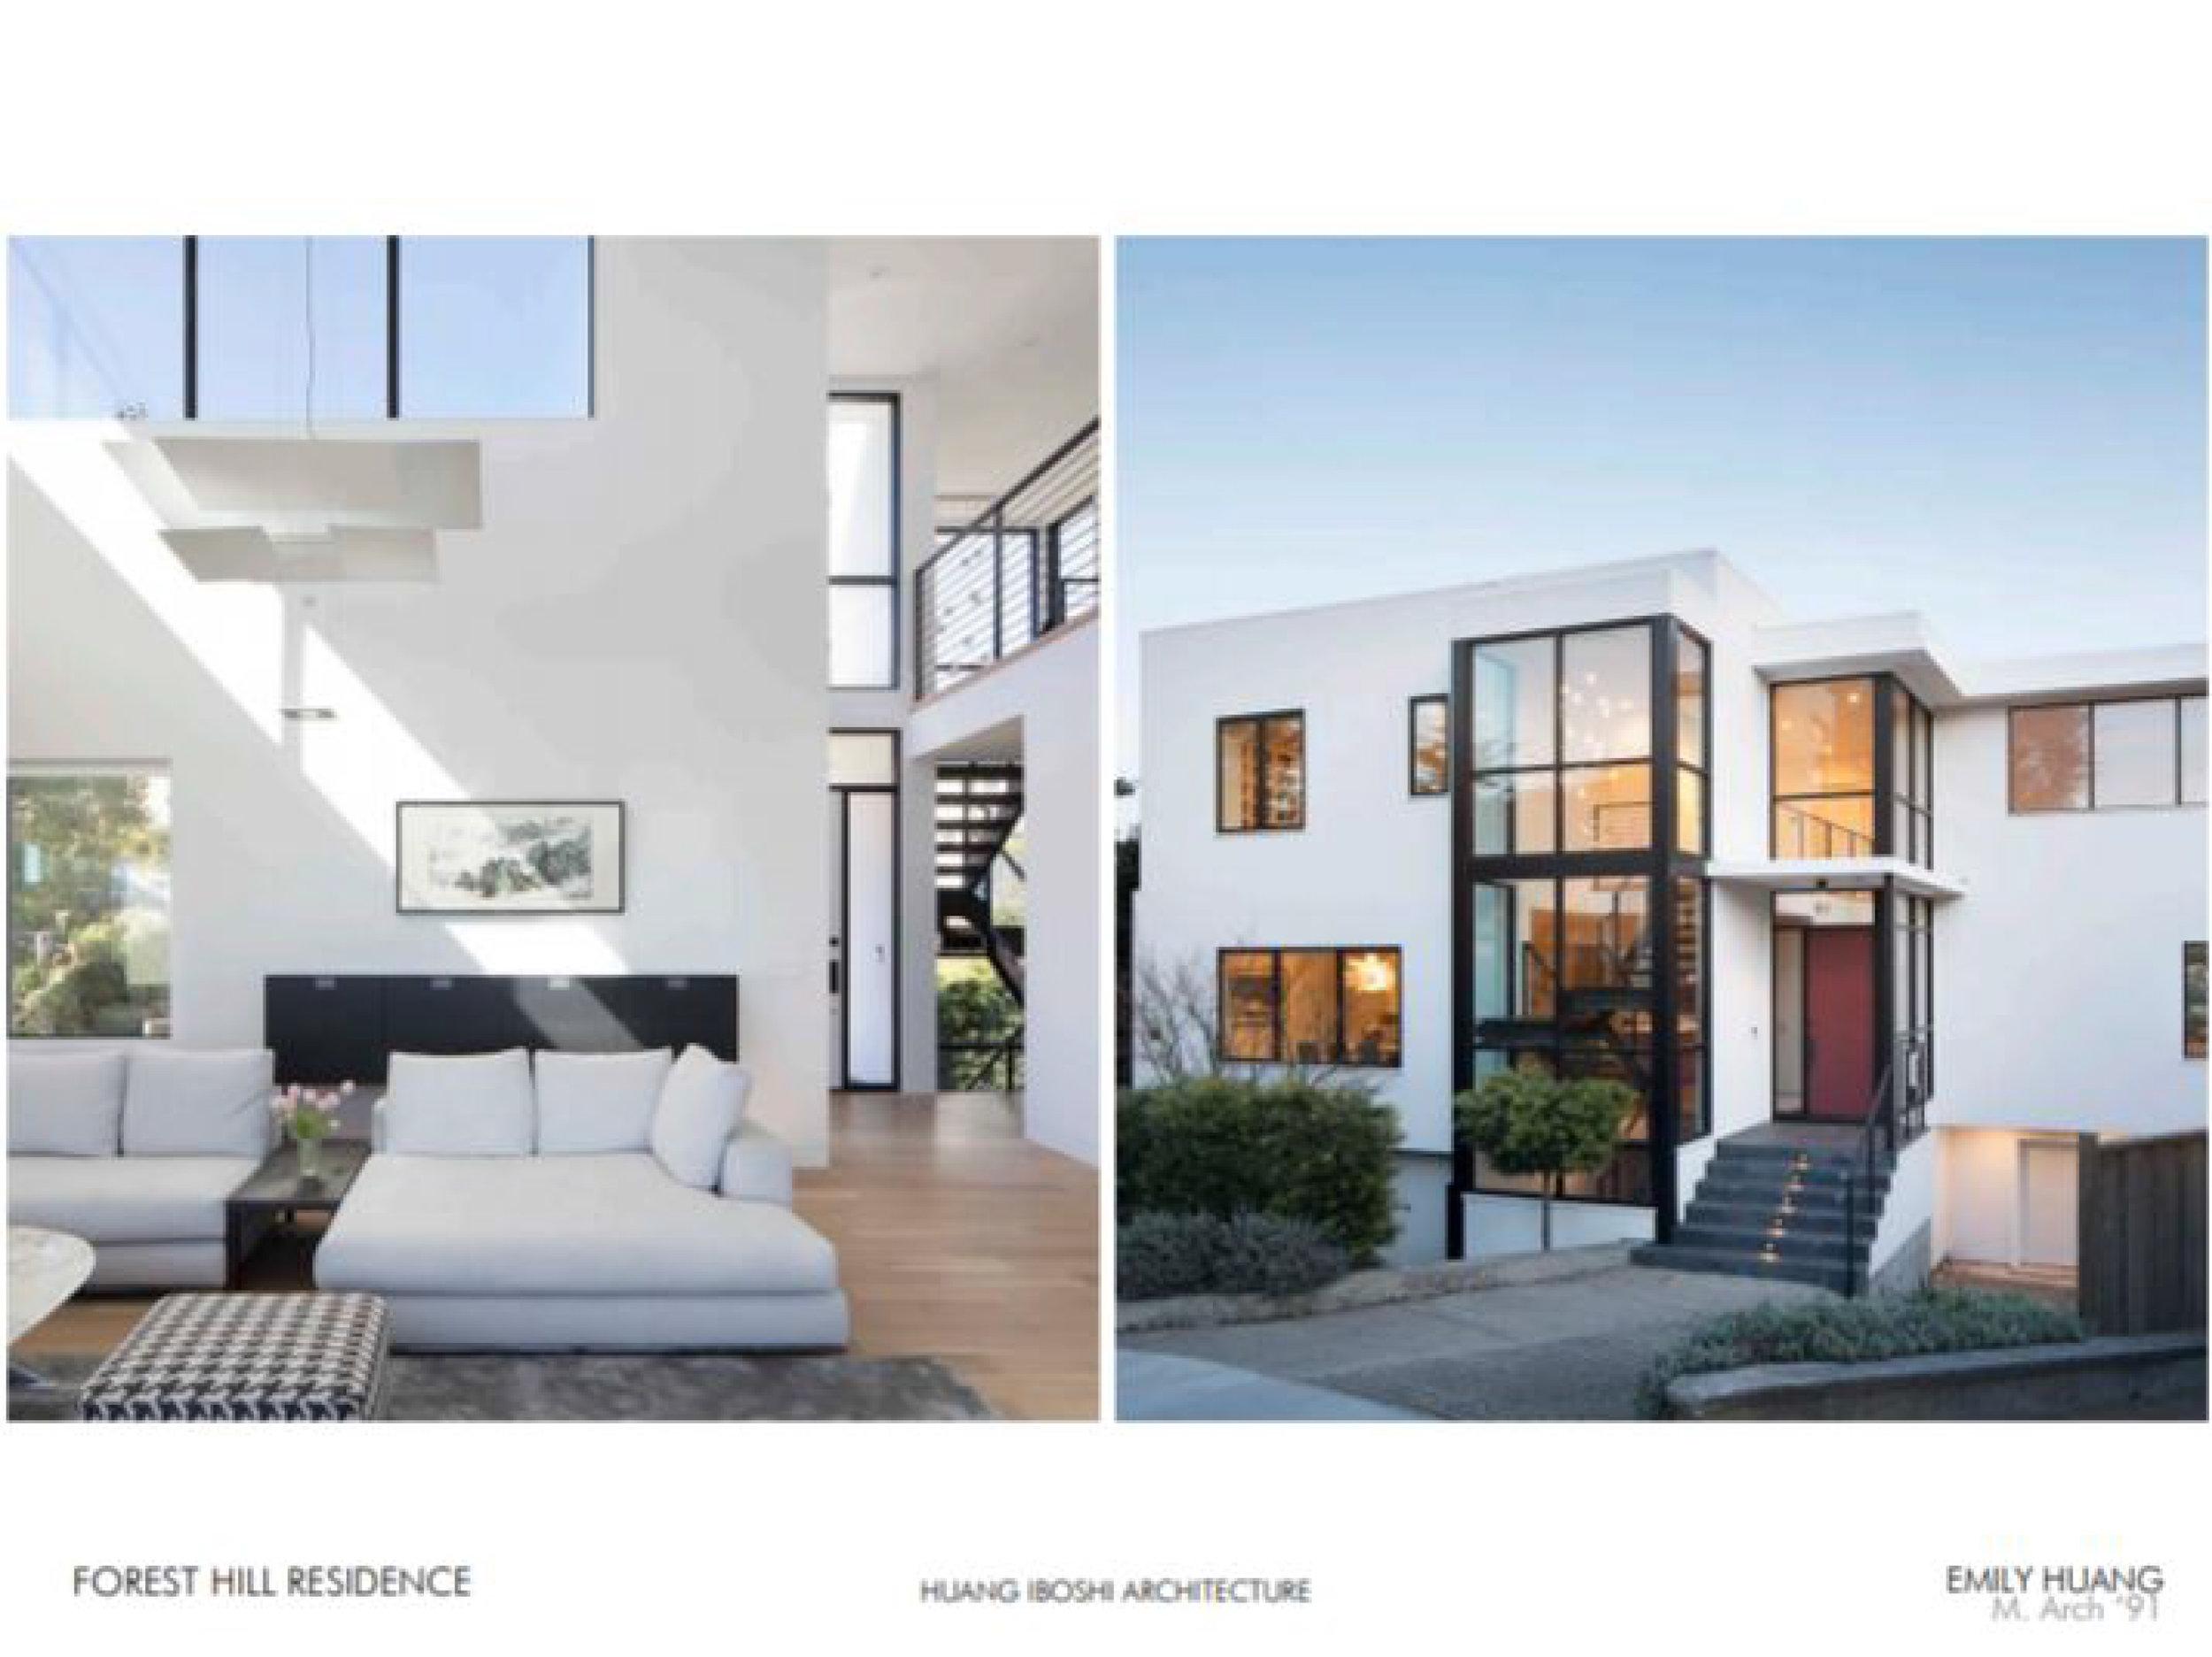 MIT ARCHITECTURE 150 SAN FRANCISCO SLIDESHOW-86 copy.jpg